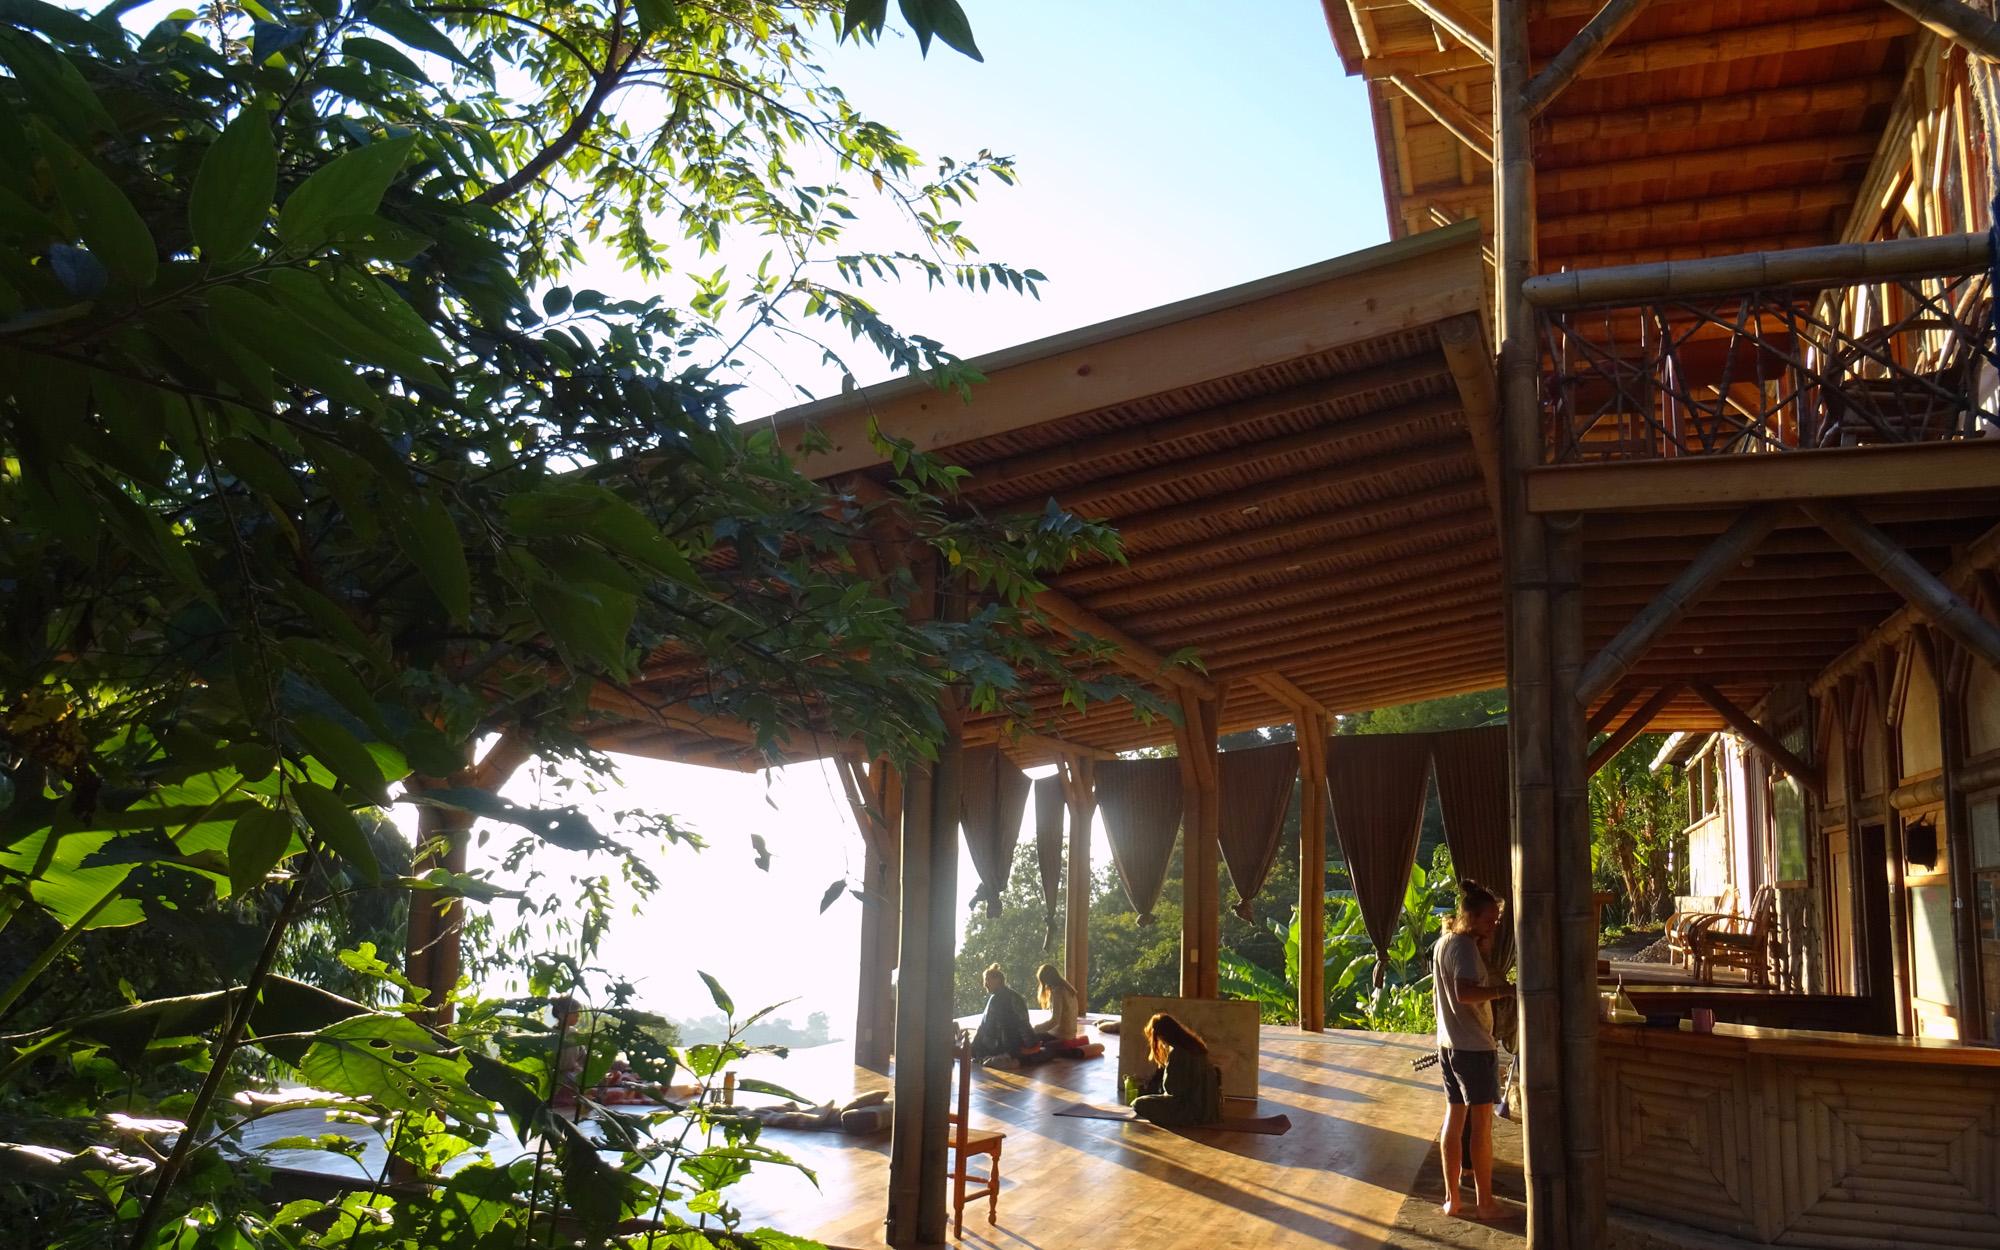 6_Bamboo_house_space.JPG